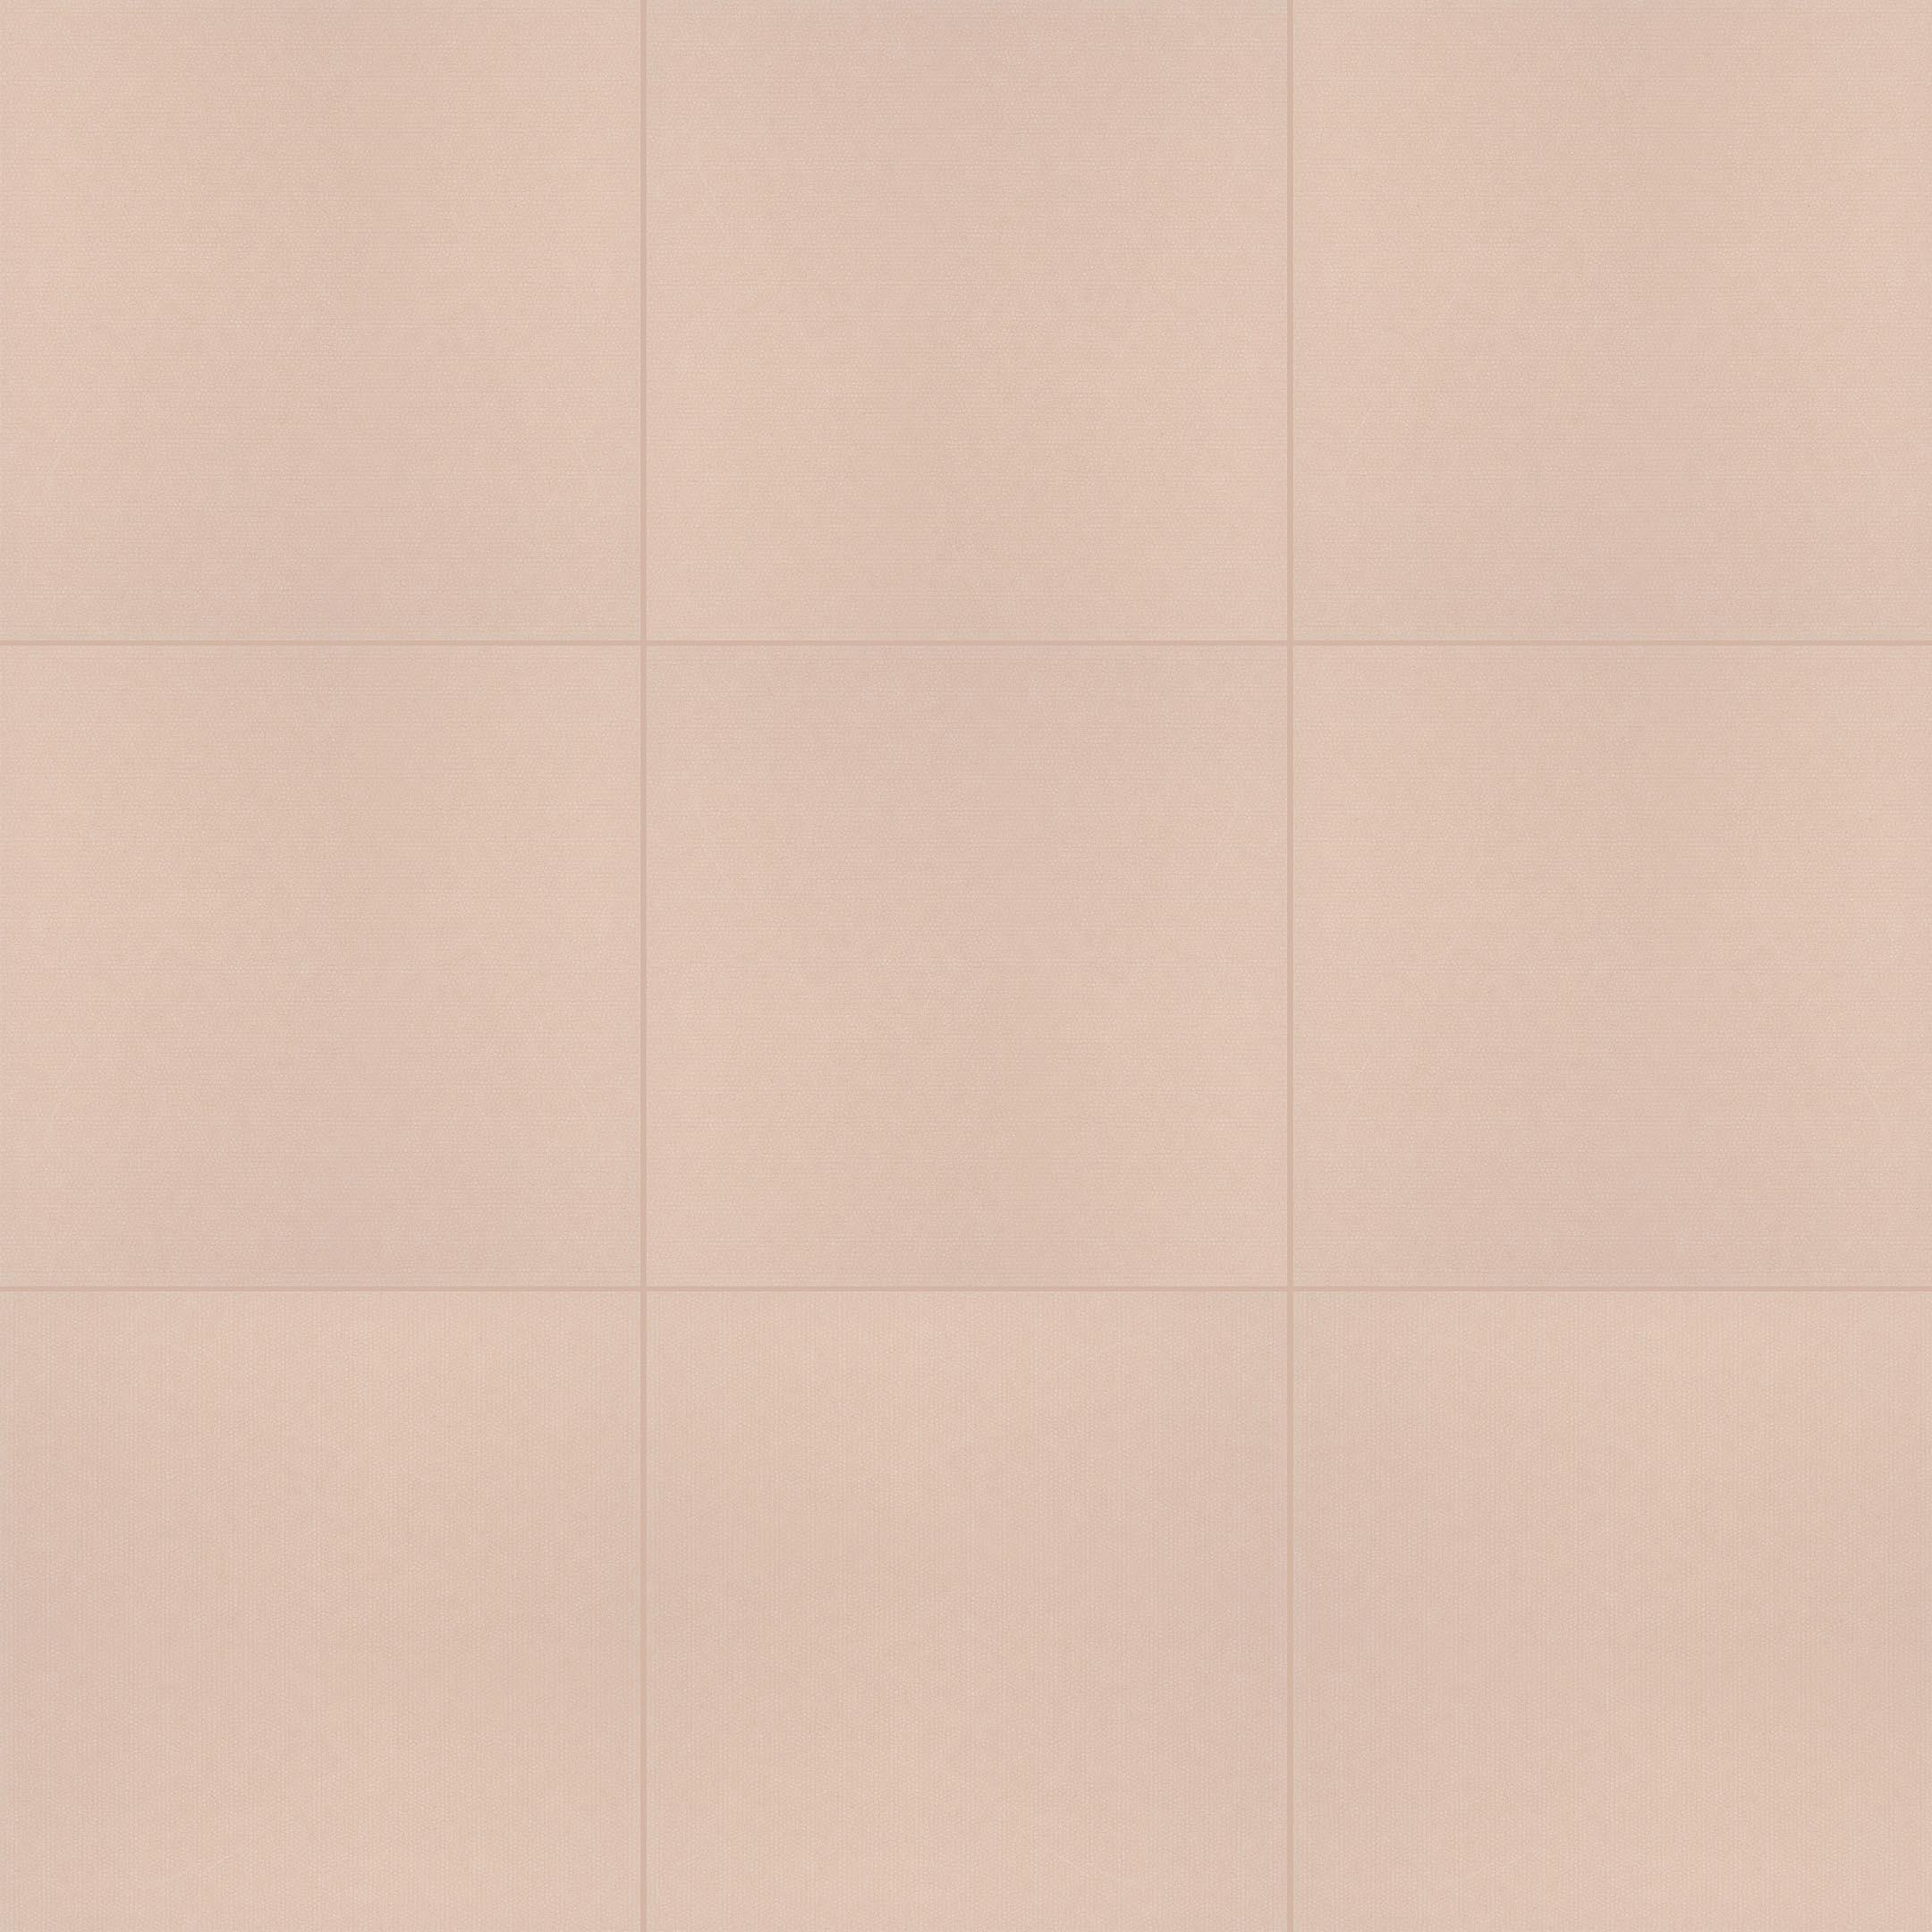 Керамогранит Unitile Нега бежевый 300x300x8 мм (14 шт.=1,26 кв.м) фото